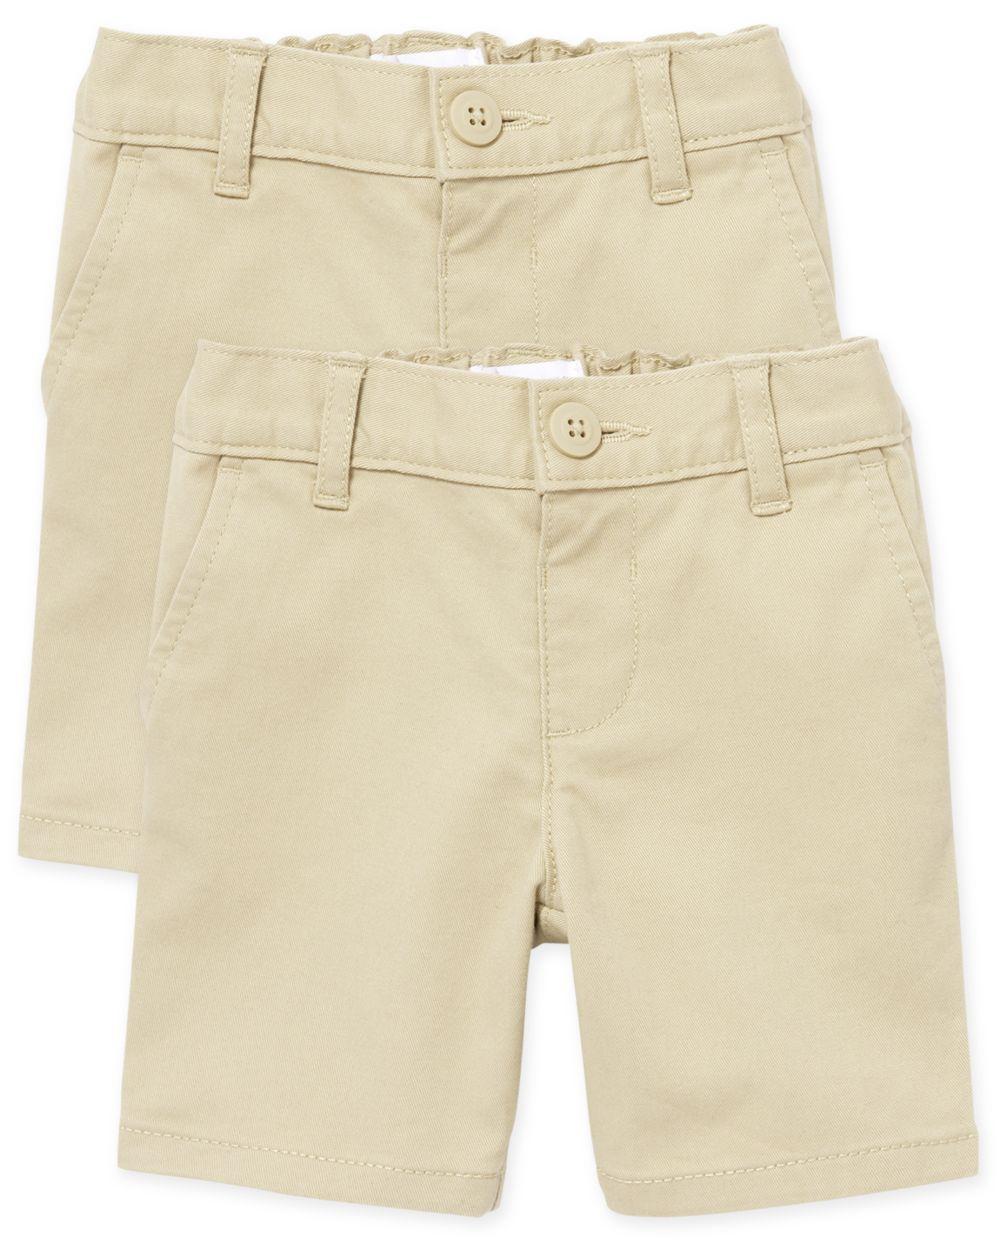 Shorts chinos uniformes para niñas pequeñas, paquete de 2